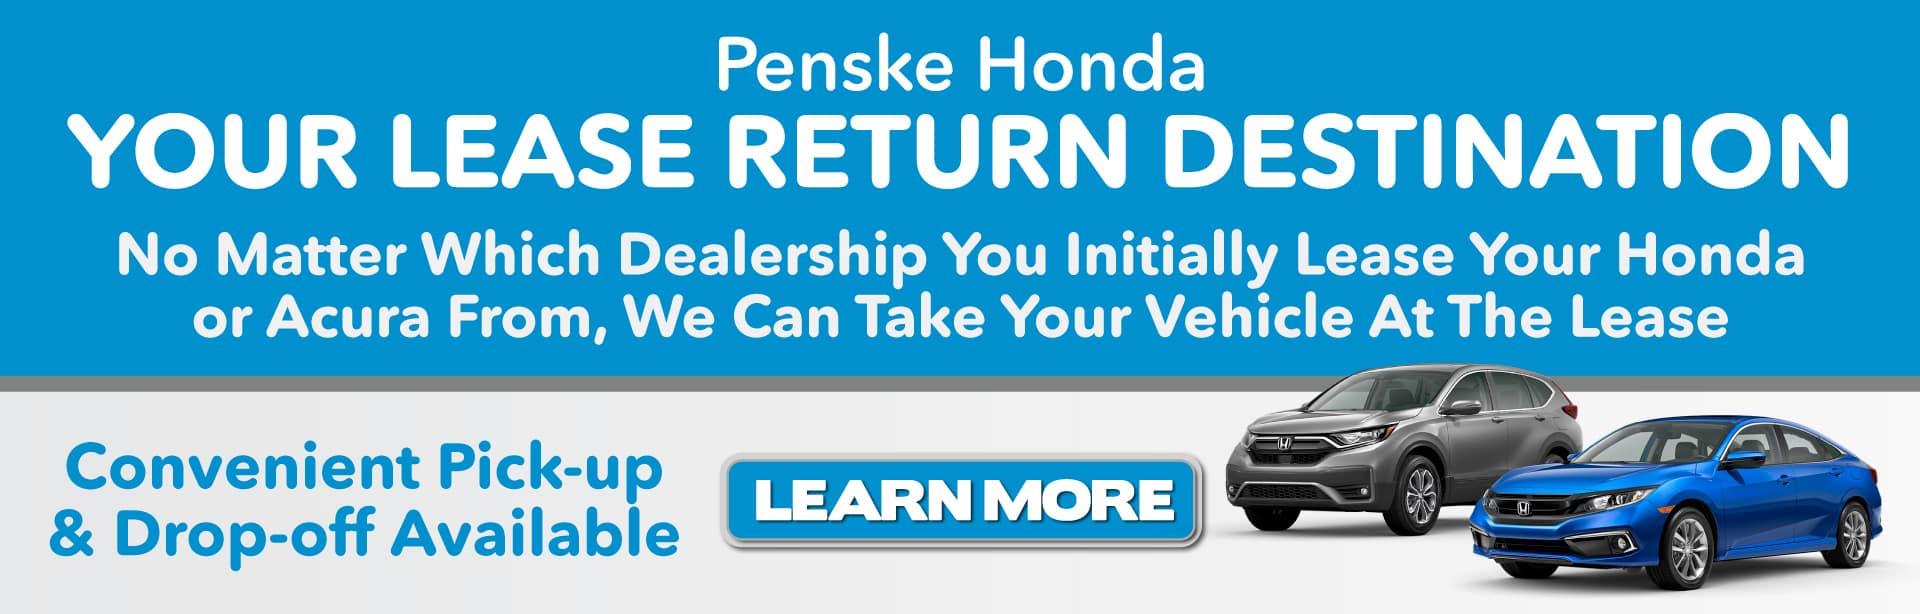 Penske Honda is Your Lease Return Destination -Learn More